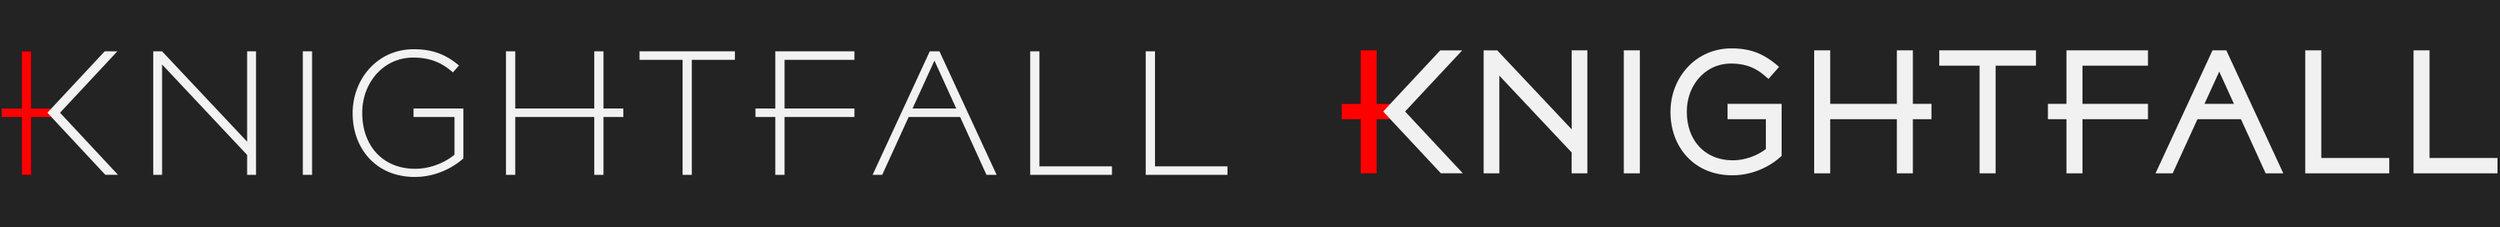 knightfall_logo.png